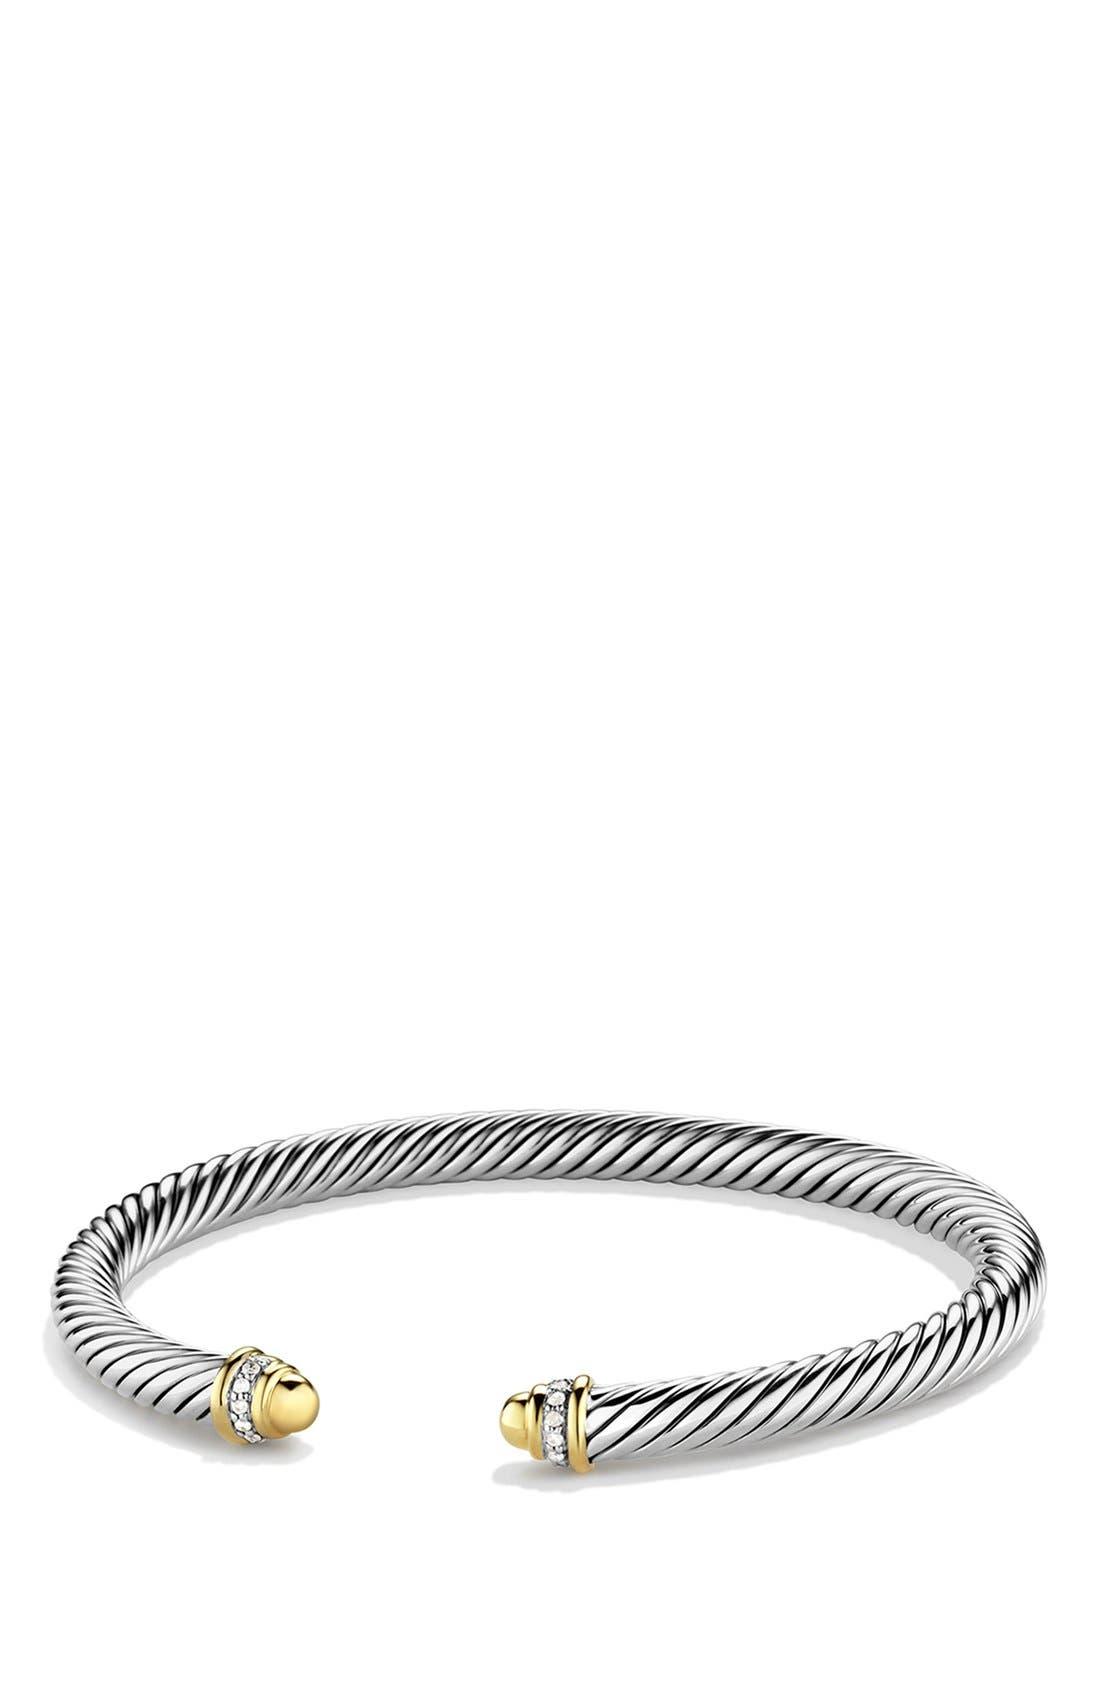 Cable Classics Bracelet with 18K Gold Domes & Diamonds, 5mm,                             Main thumbnail 1, color,                             711